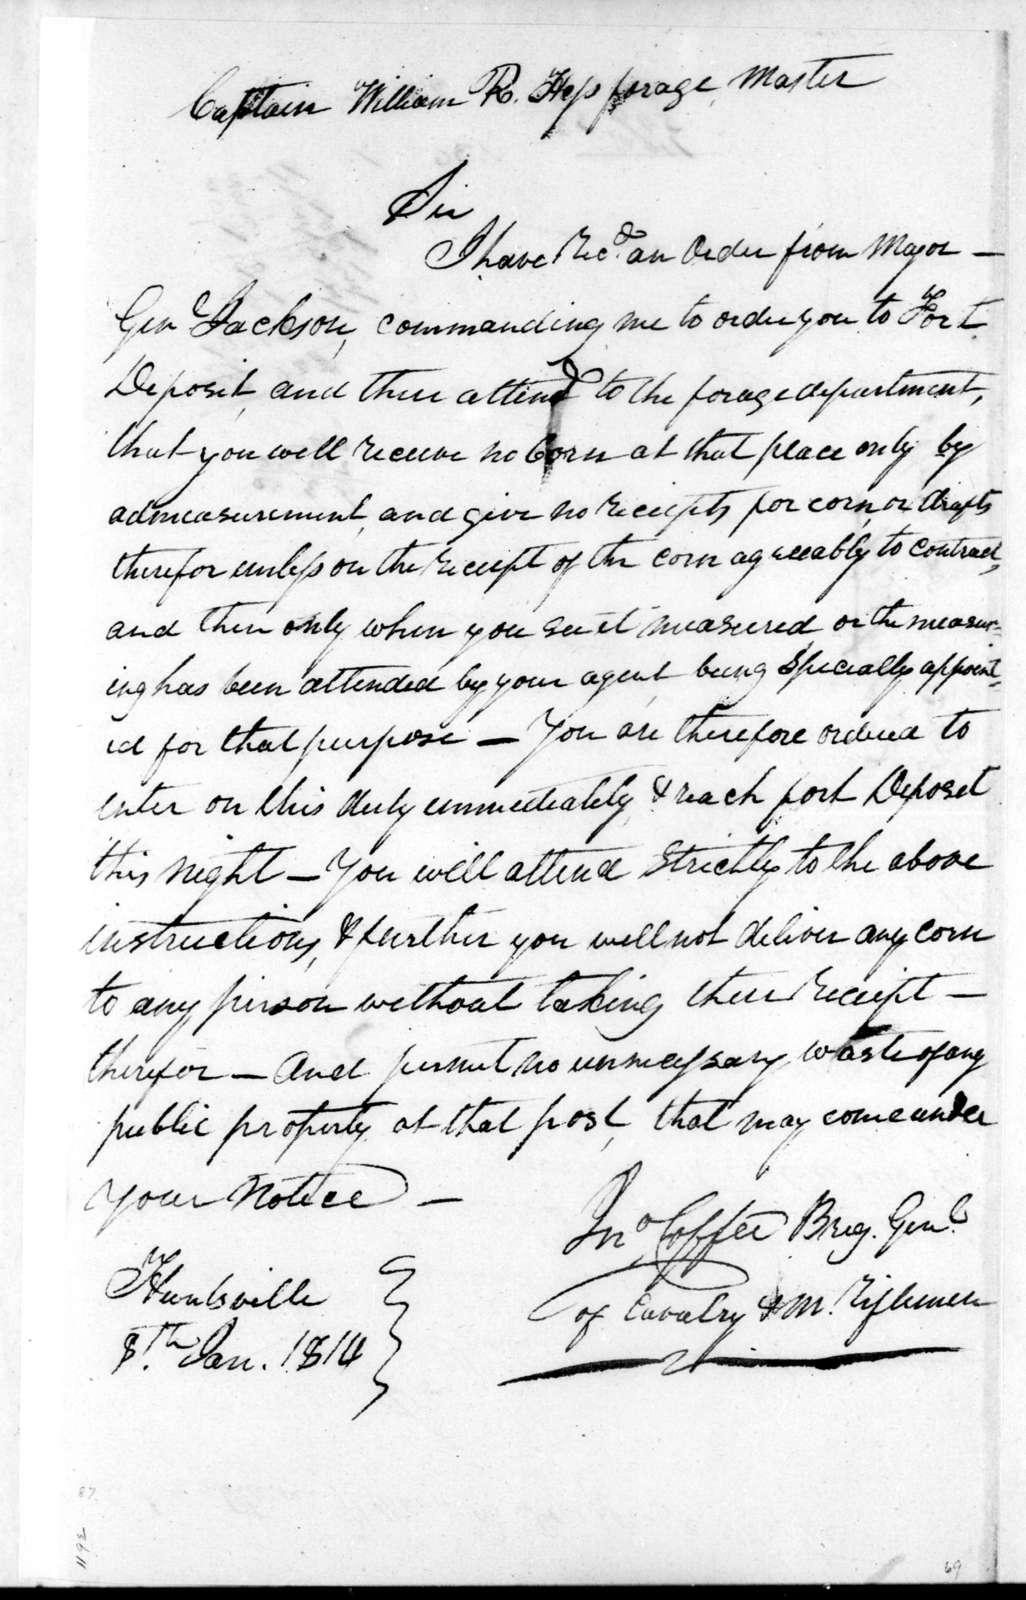 John Coffee to William R. Hess, January 8, 1814